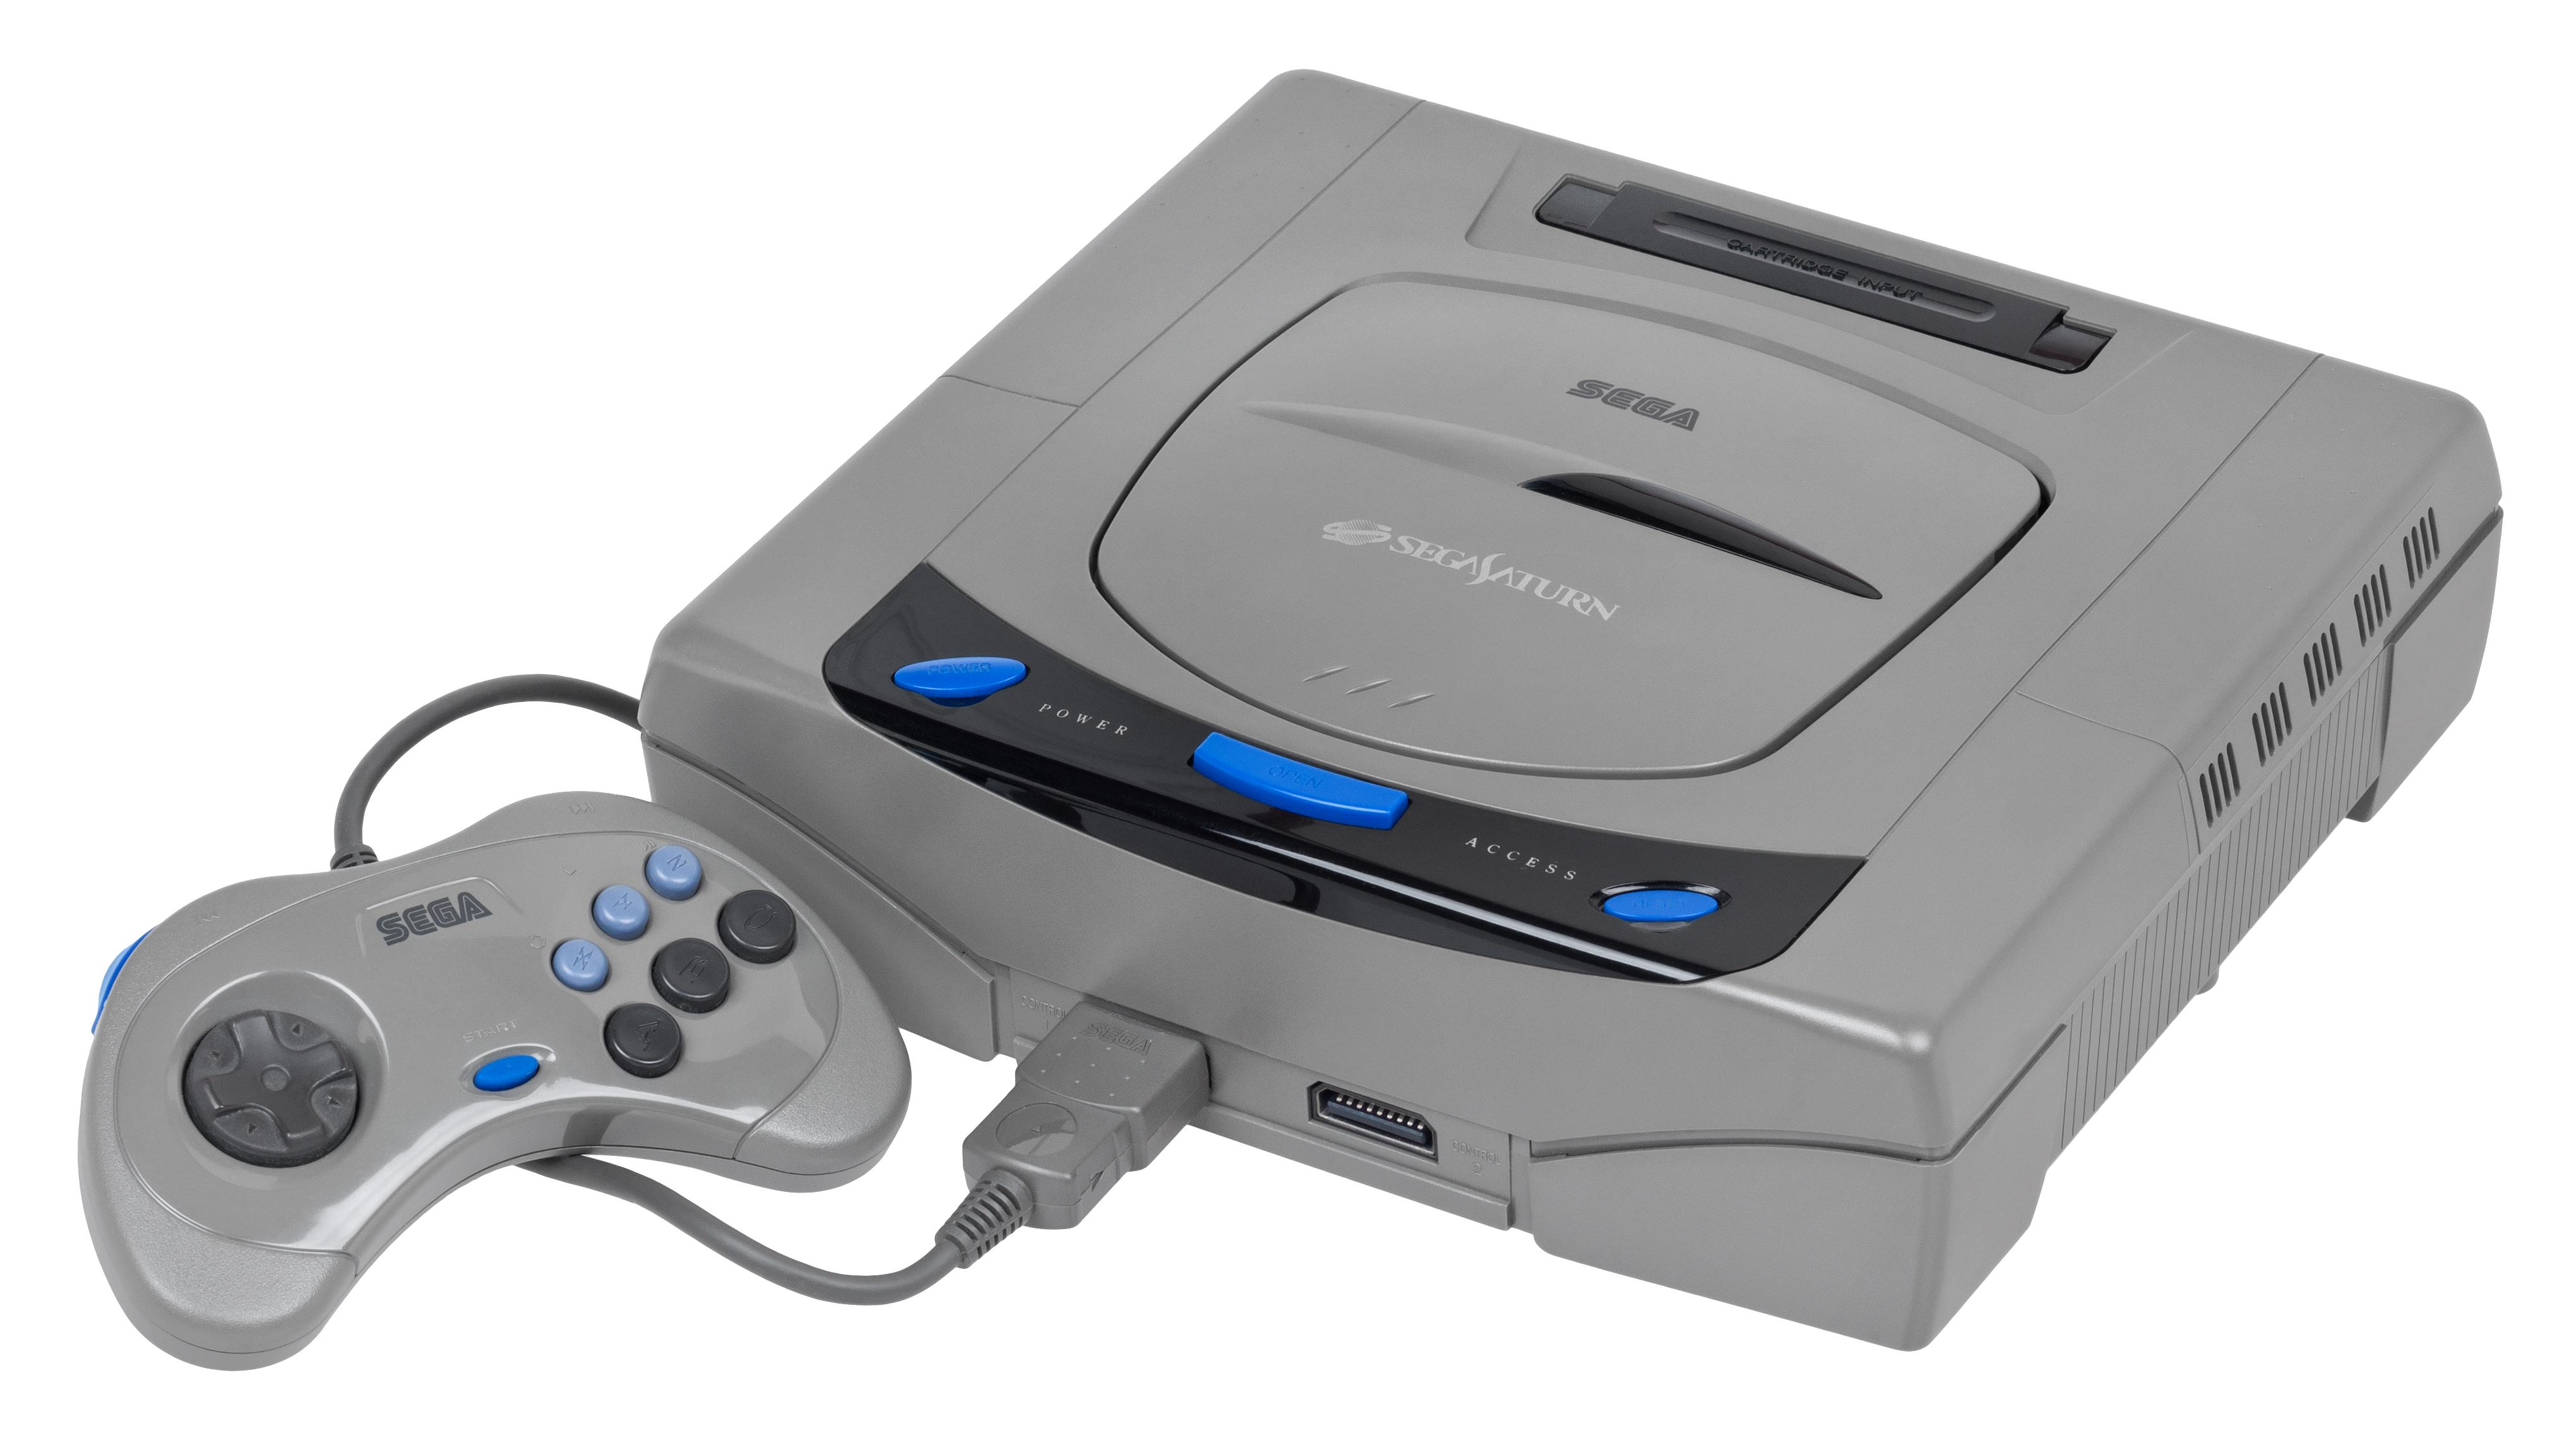 https://upload.wikimedia.org/wikipedia/commons/9/95/Sega-Saturn-JP-Mk1-Console-Set.jpg